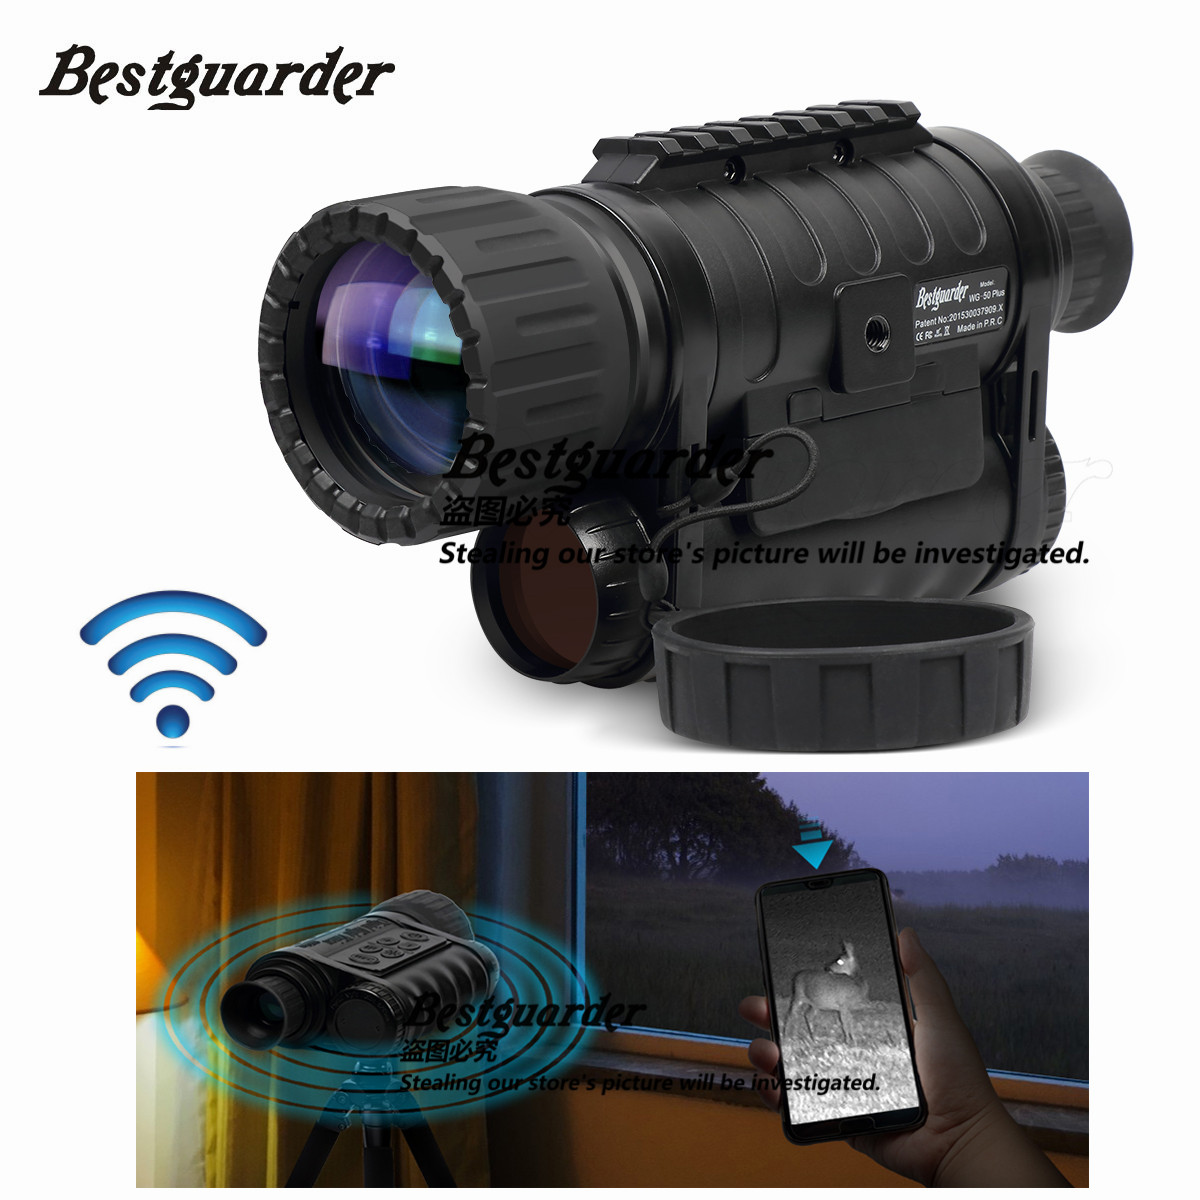 Bestguarder WG-50 Plus Nachtsicht Teleskop mit Wifi Funktion IR Monokulare Wildlife 6x50mm Jagd Infrarot 850NM HD kamera